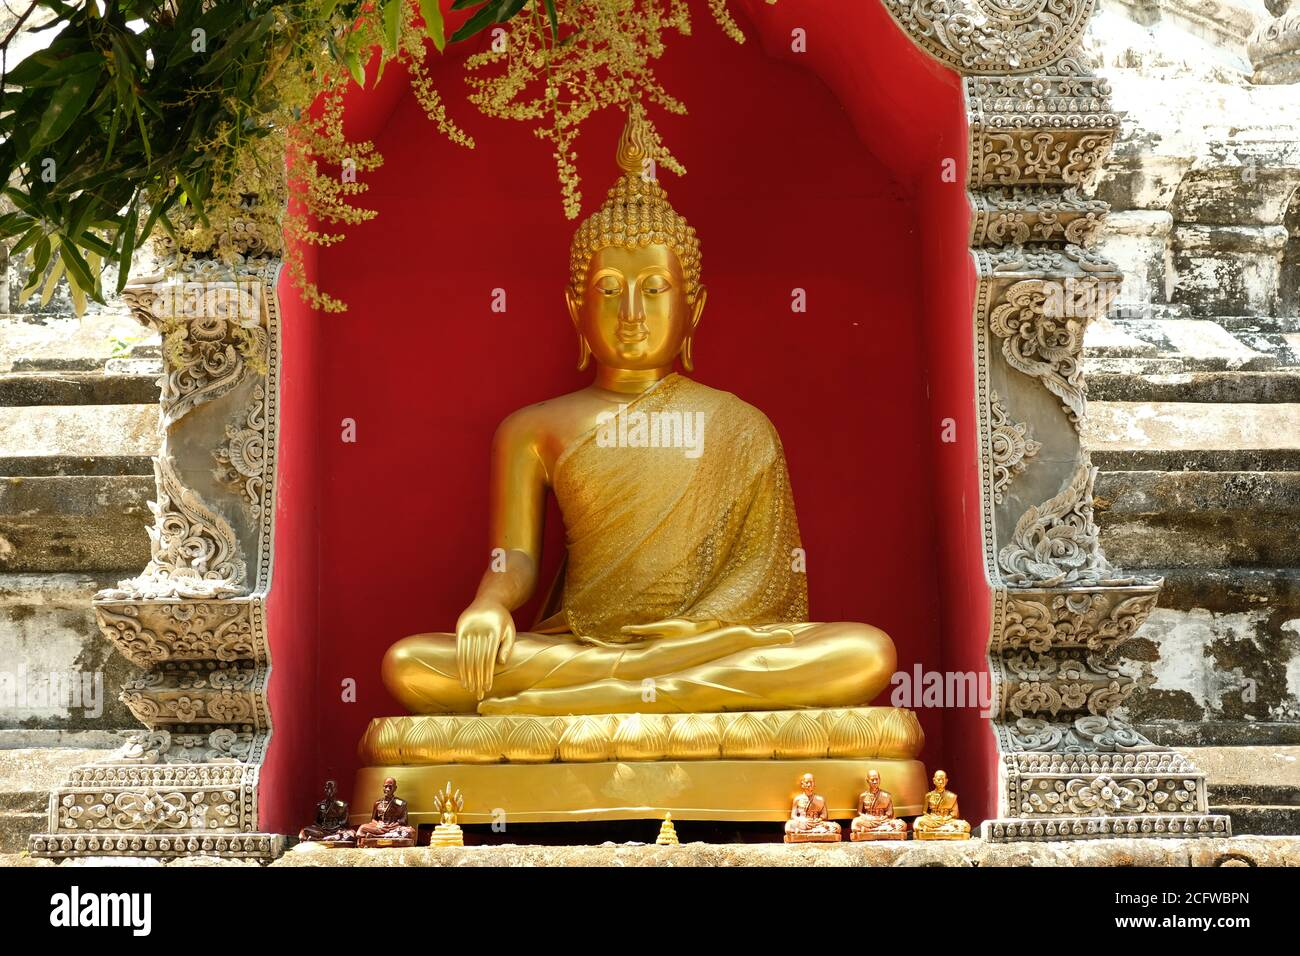 Chiang Mai Thailand - Golden Buddha statue in Temple Wat Buppharam Stock Photo